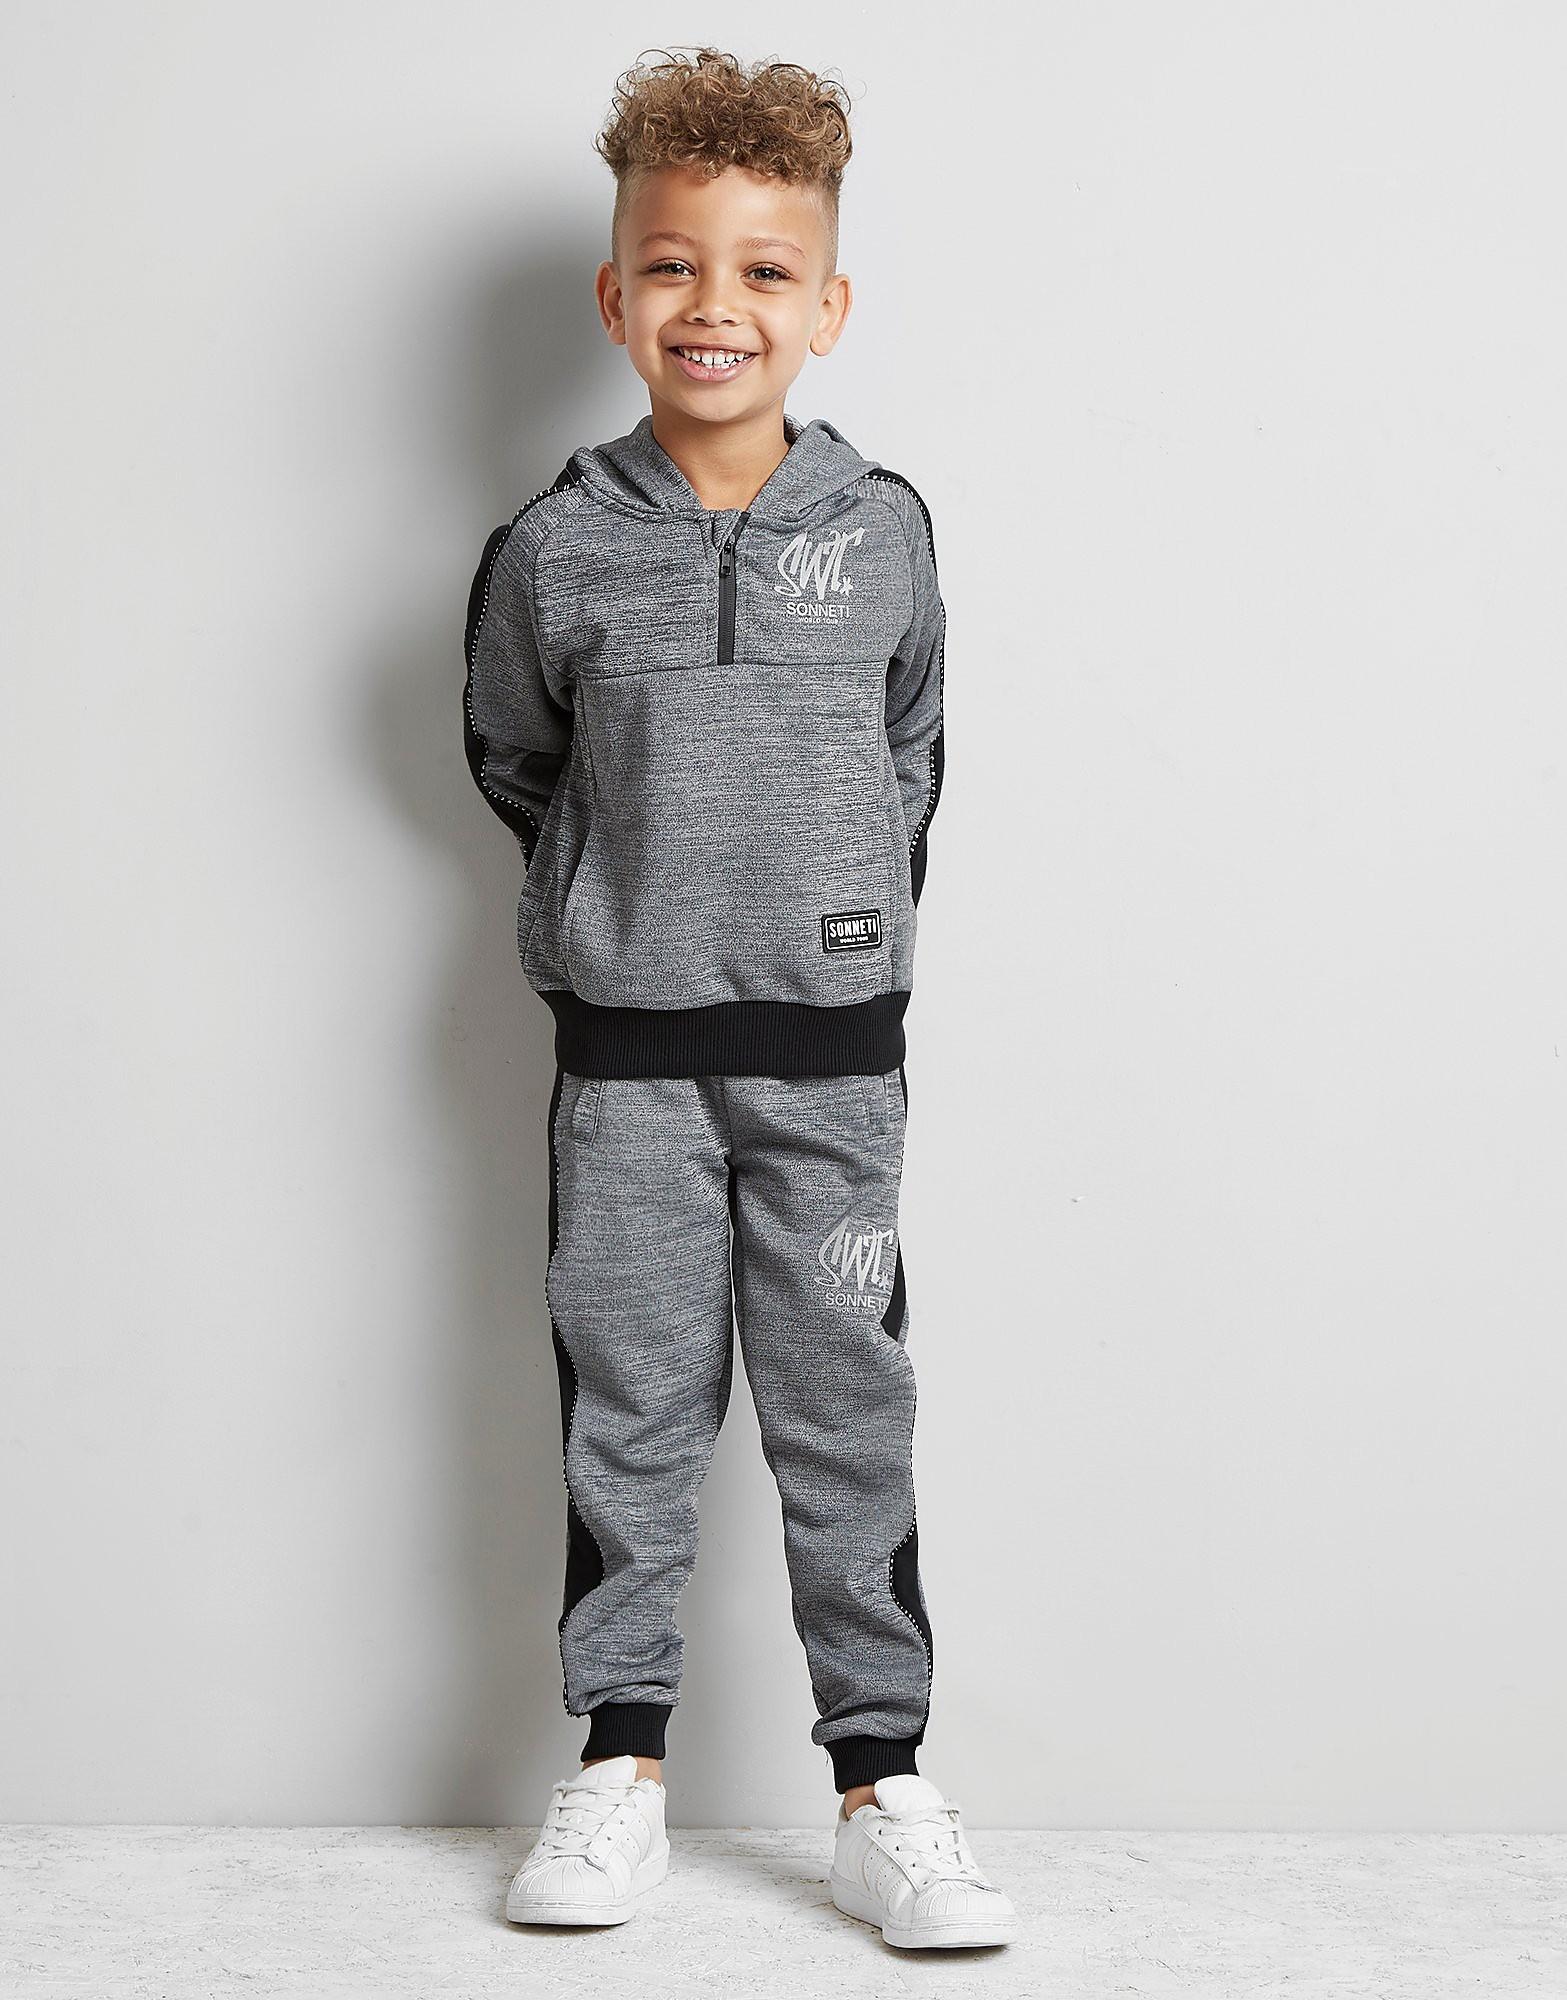 Sonneti Mini Welby 1/2 Zip Suit Children